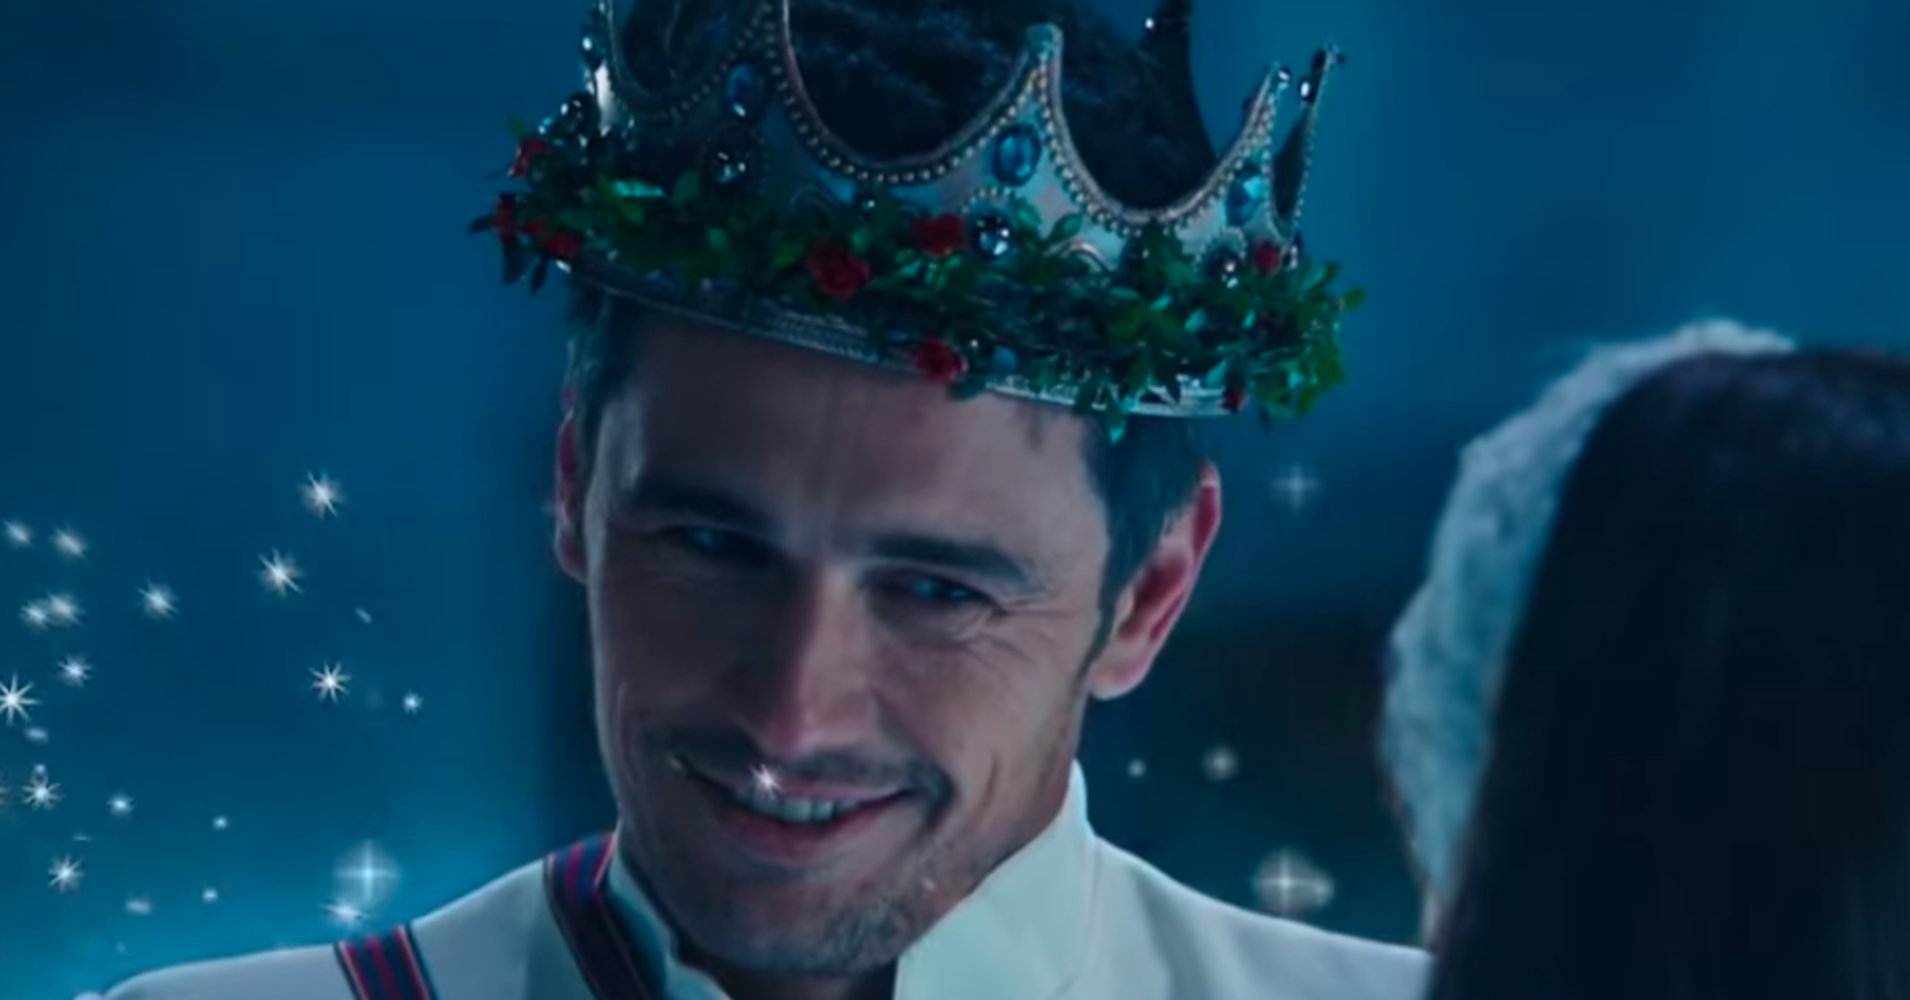 James Franco Stars In The Fake Hallmark Christmas Movies We Wish Were Real Huffpost Hallmark Christmas Movies James Franco Christmas Movies